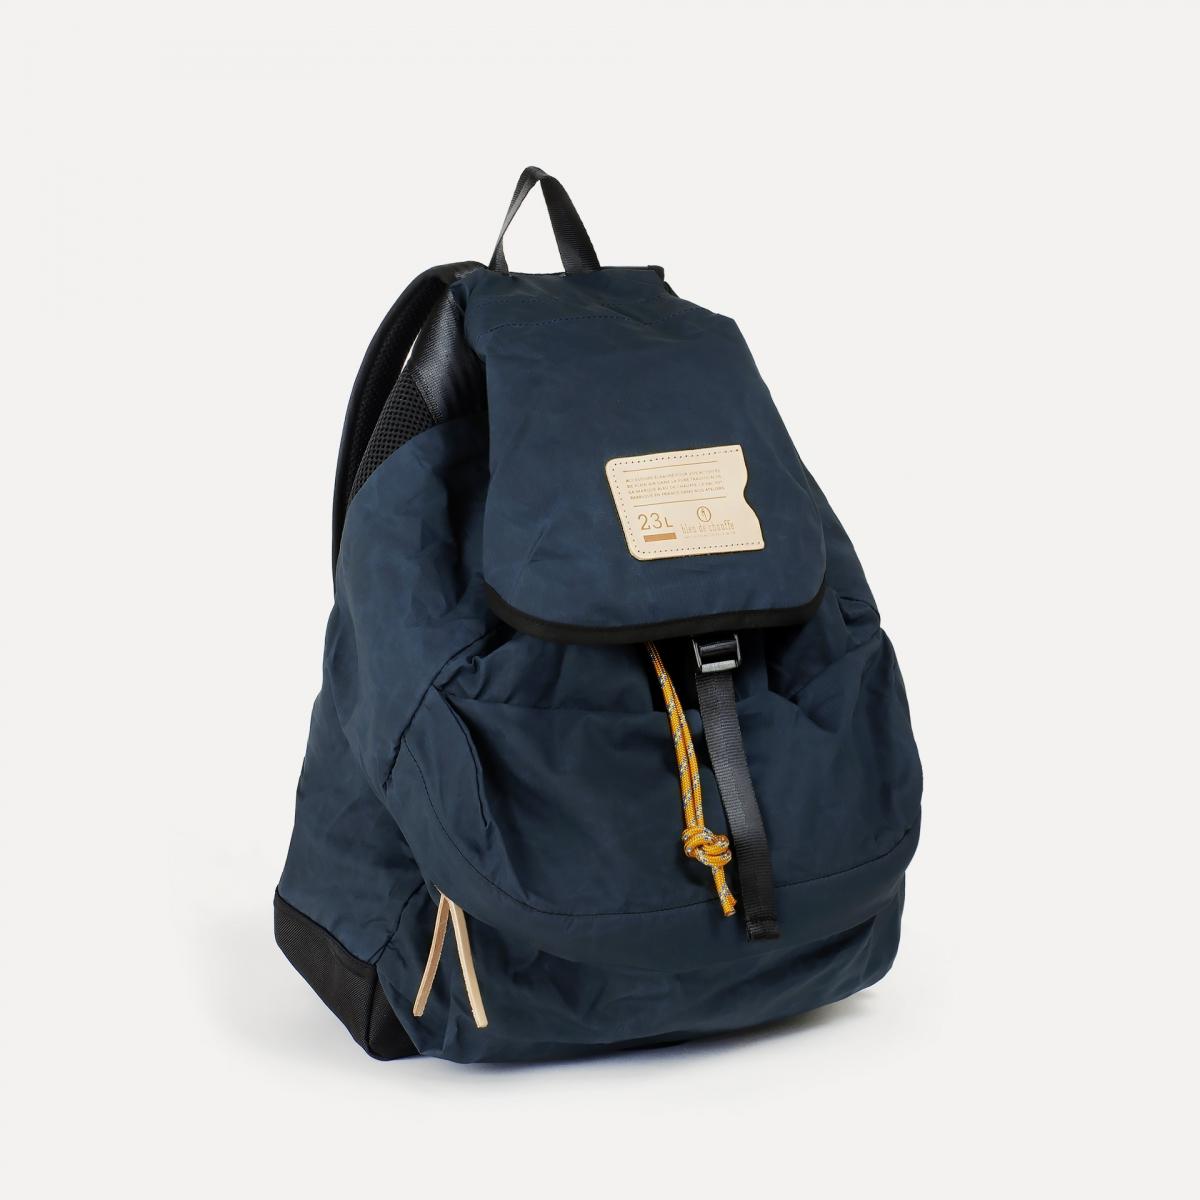 23L Bayou Backpack - Hague Blue (image n°2)